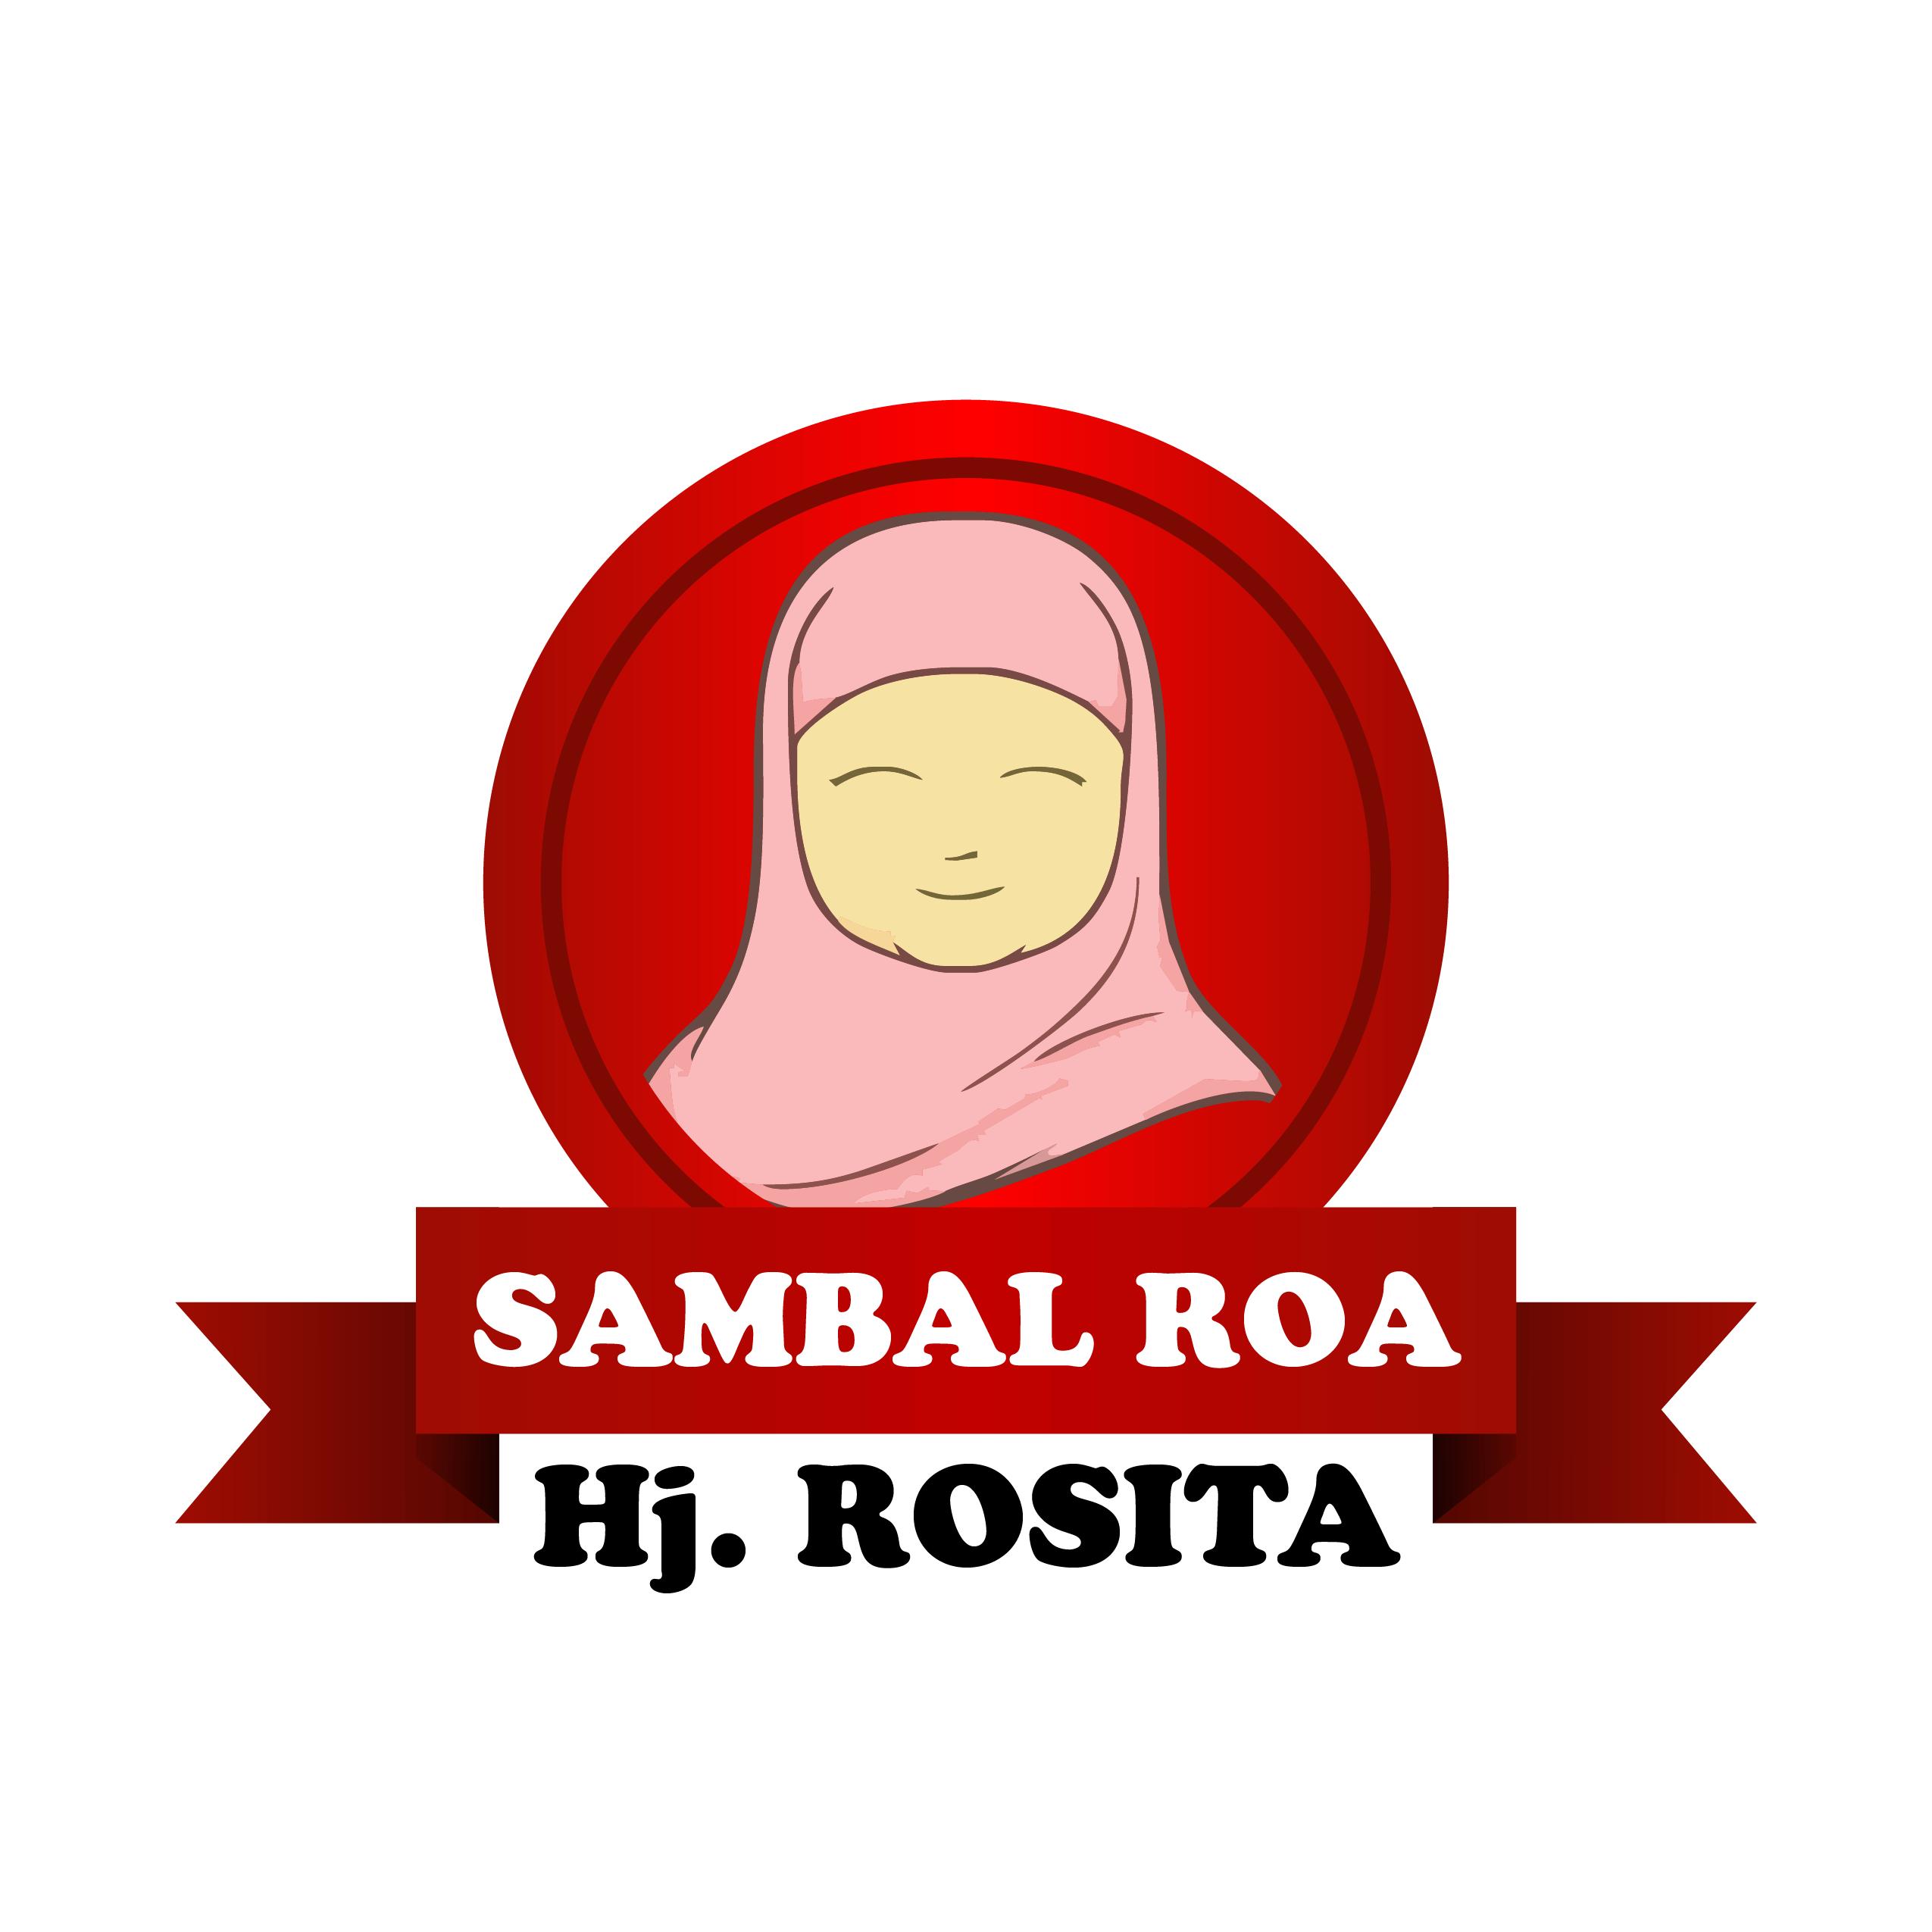 Sambal Roa Hj. Rosita Logo